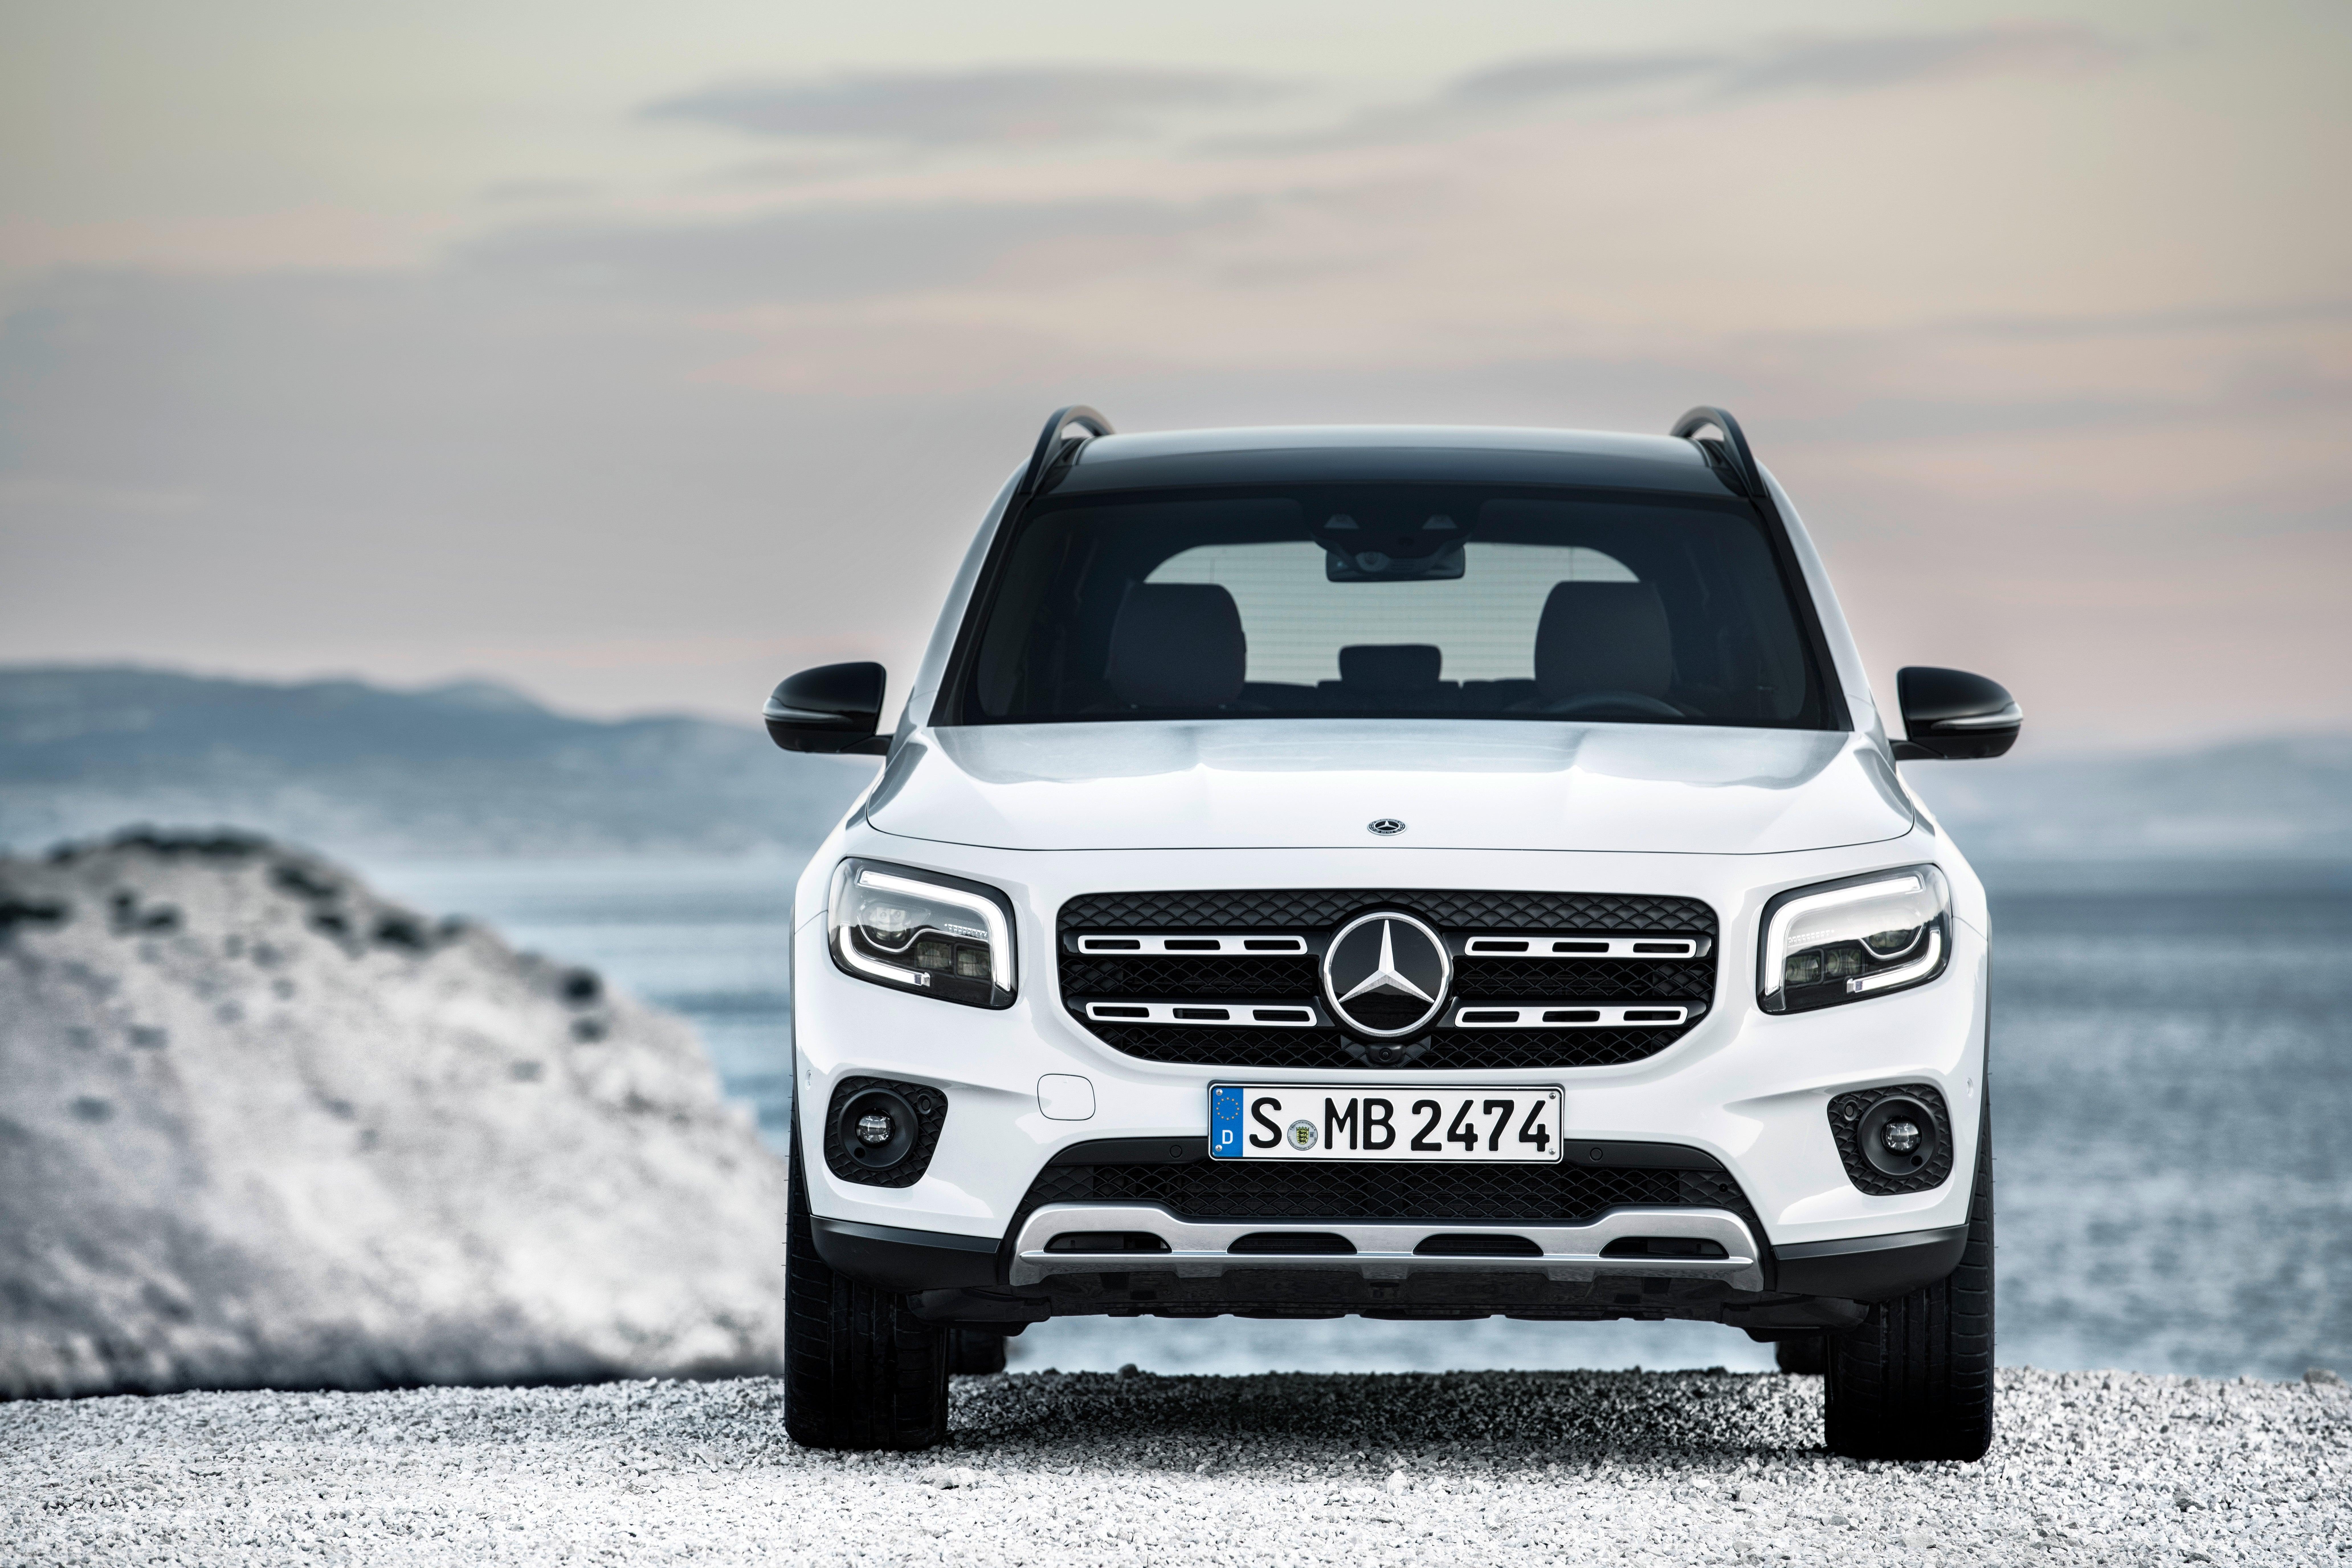 2018 - [Mercedes-Benz] GLB - Page 6 Mincid0moxtlwmrfsuld